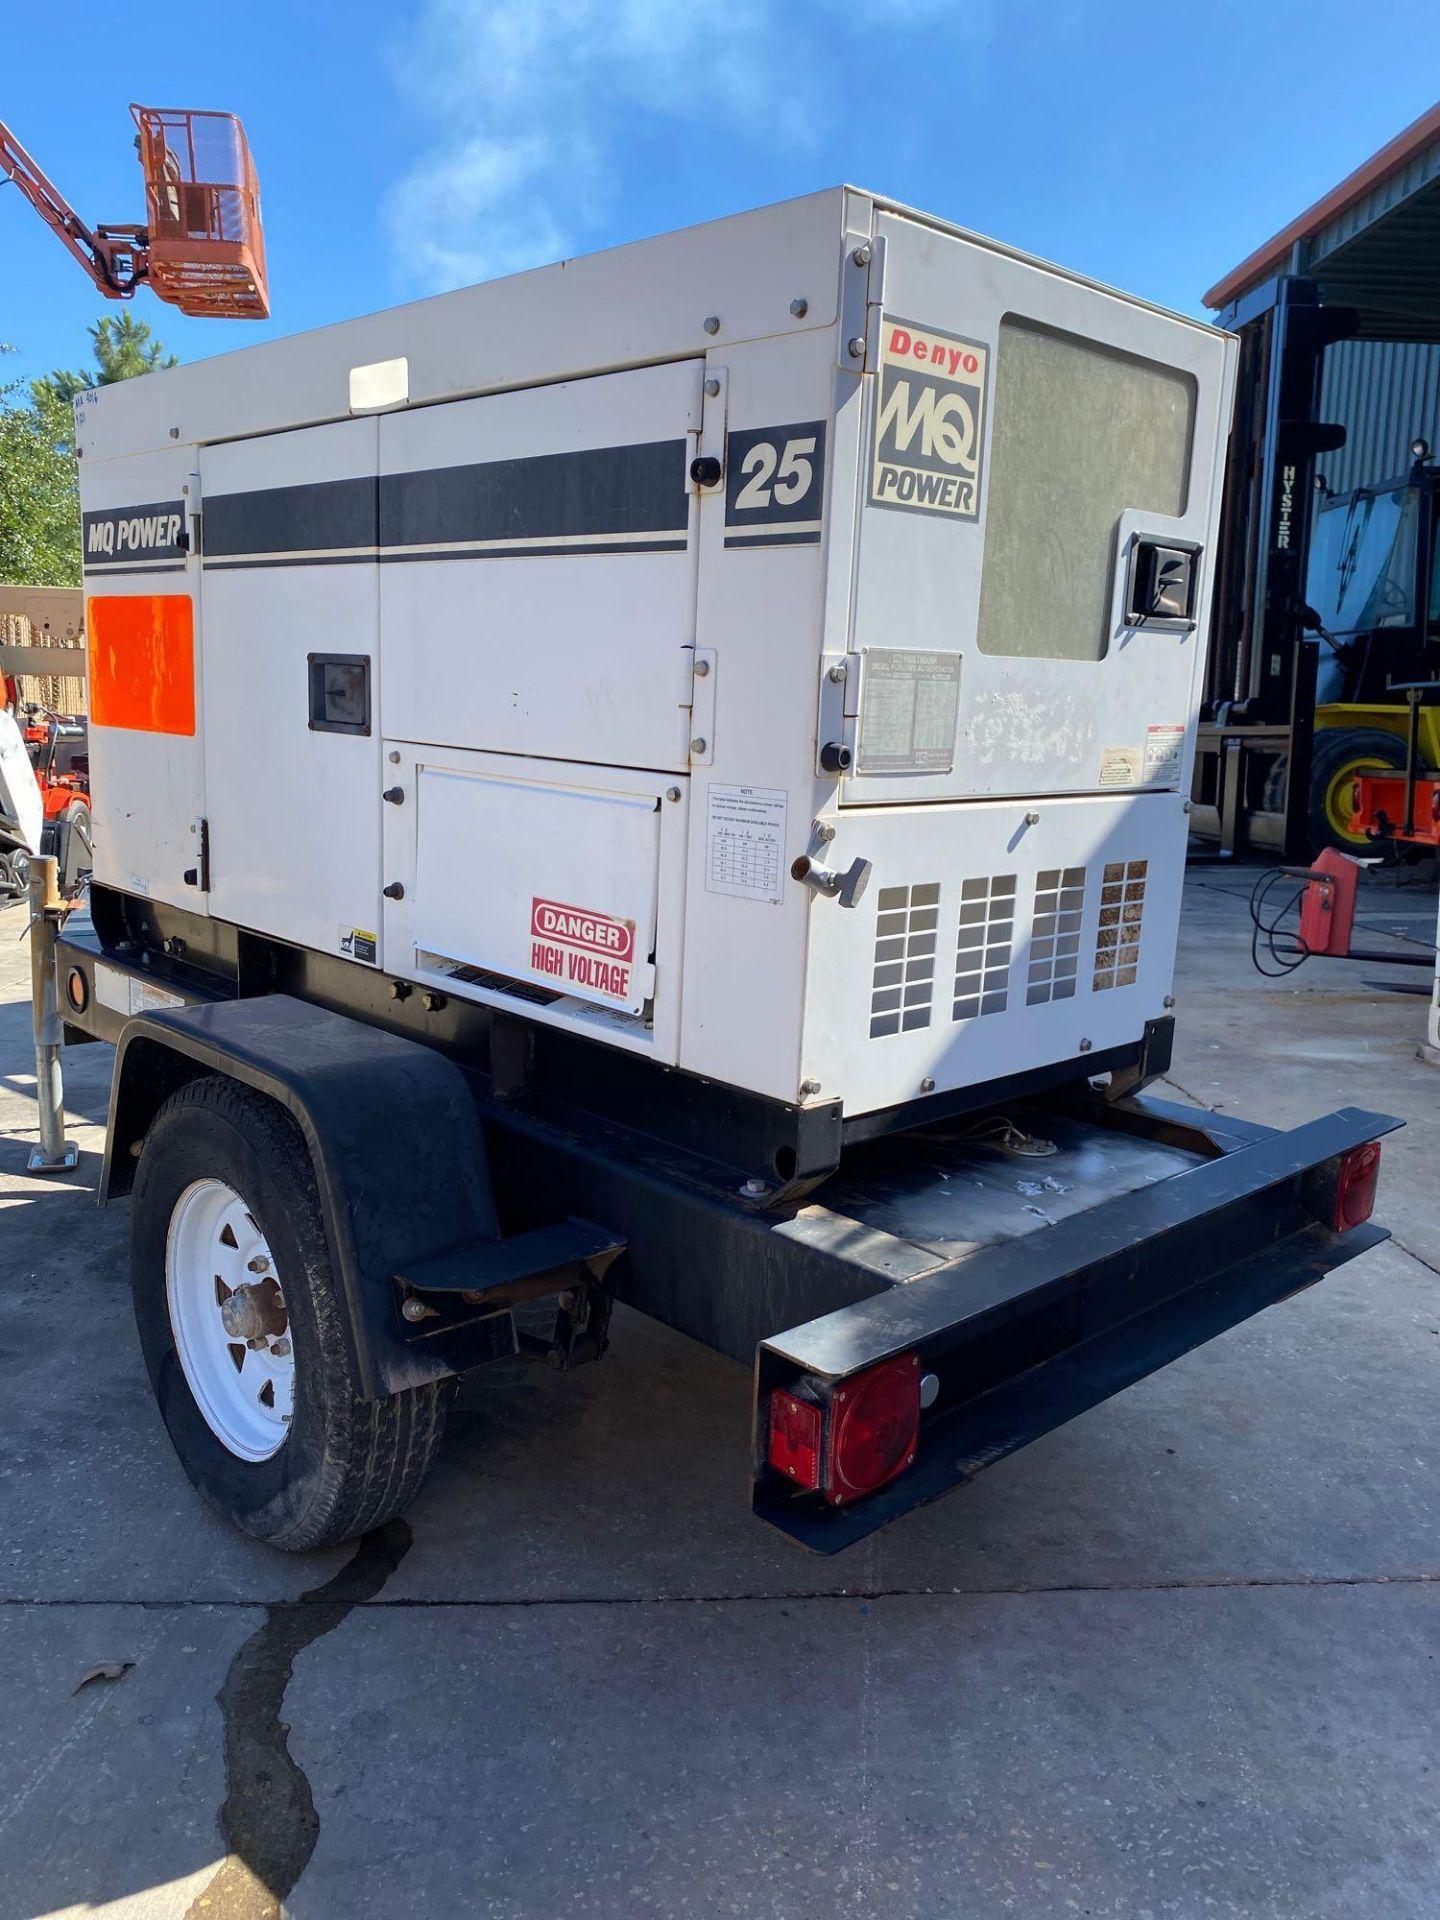 Lot 35F - 2012 WHISPERWATT MQ POWER DIESEL GENERATOR, TRAILER MOUNTED, 20KW, 25KVA, RUNS AND OPERATES